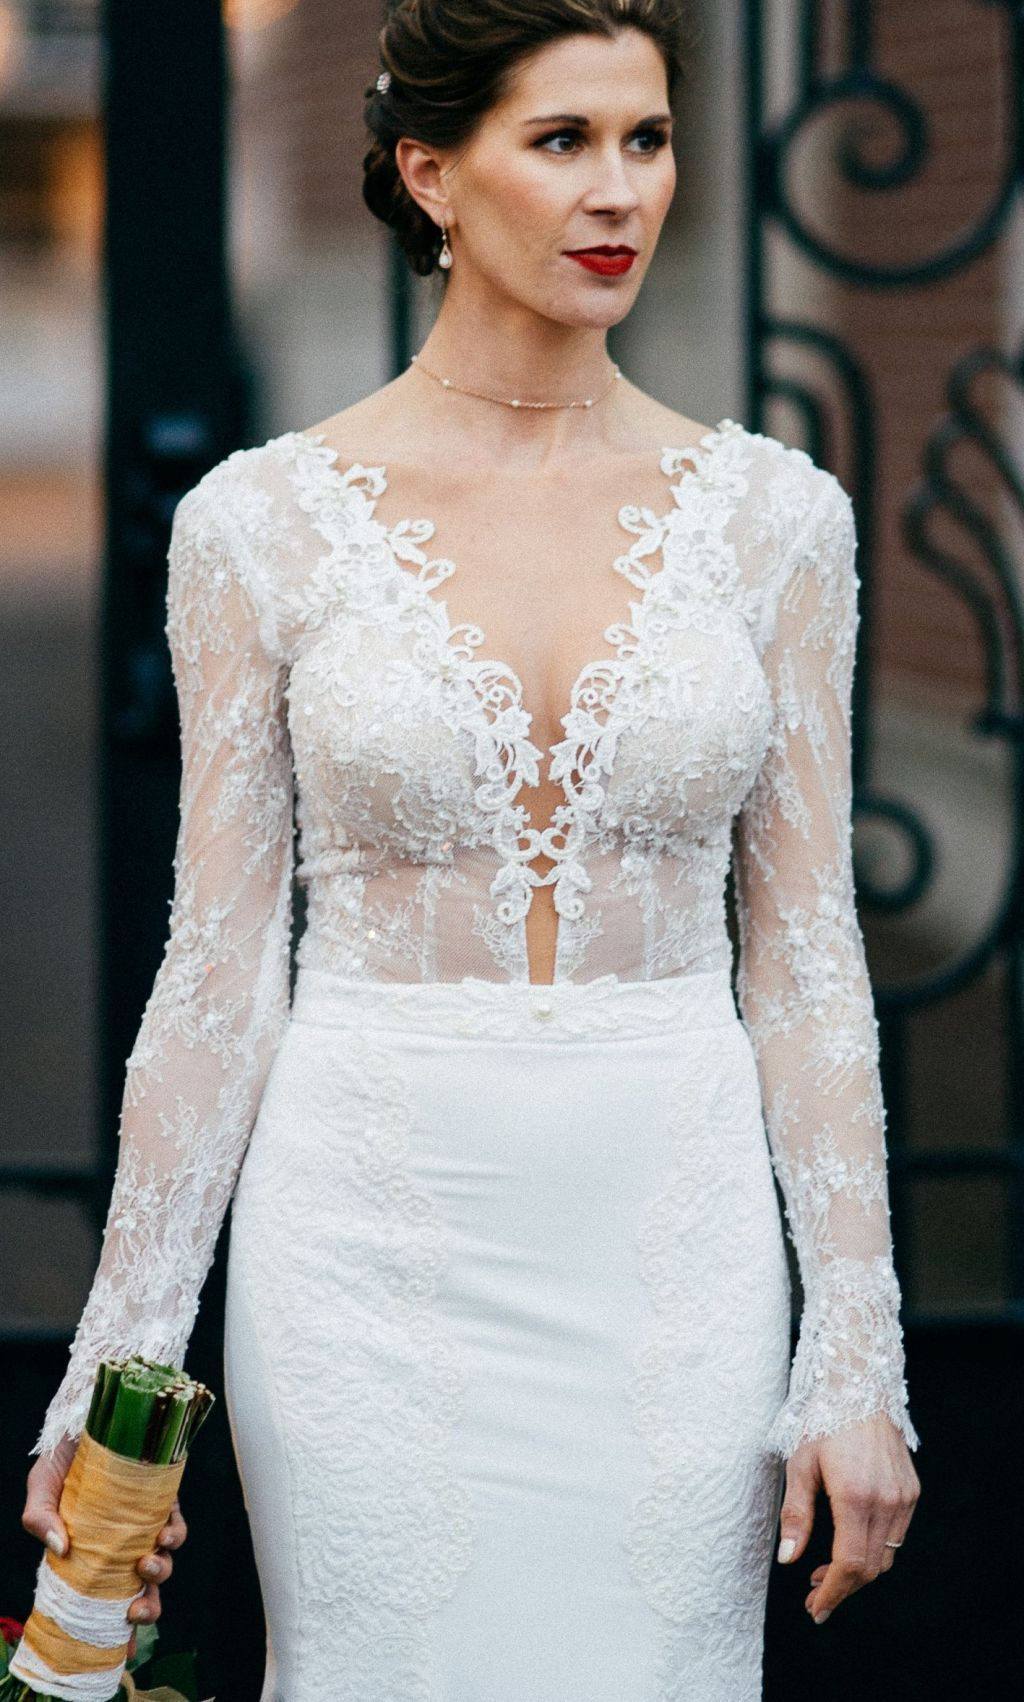 Custom wedding dress designers  Affordable Custom Wedding Dresses Inspired by Haute Couture designs